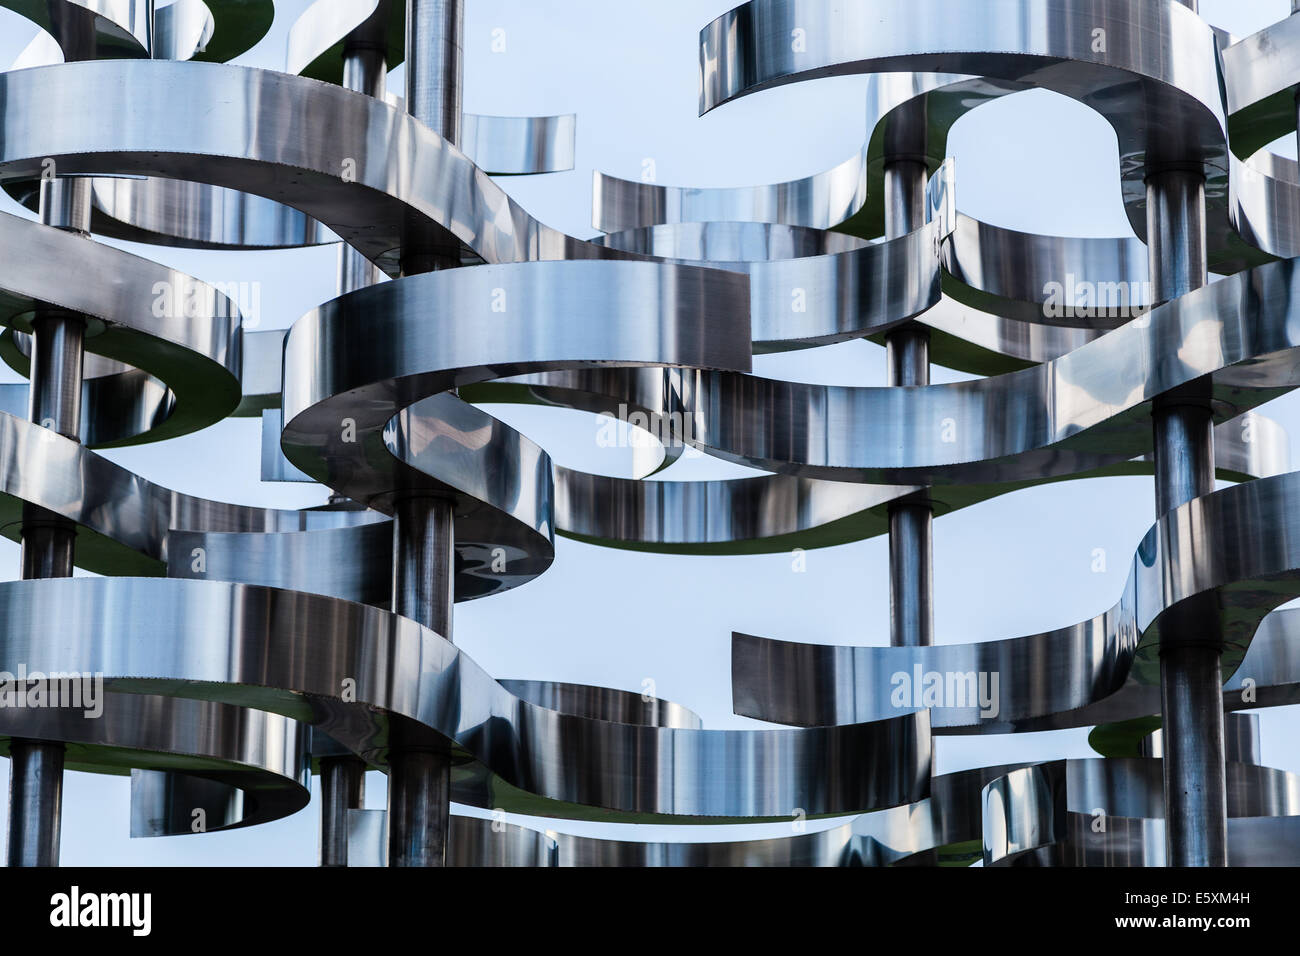 Metal Sculpture, Orlando FL - Stock Image